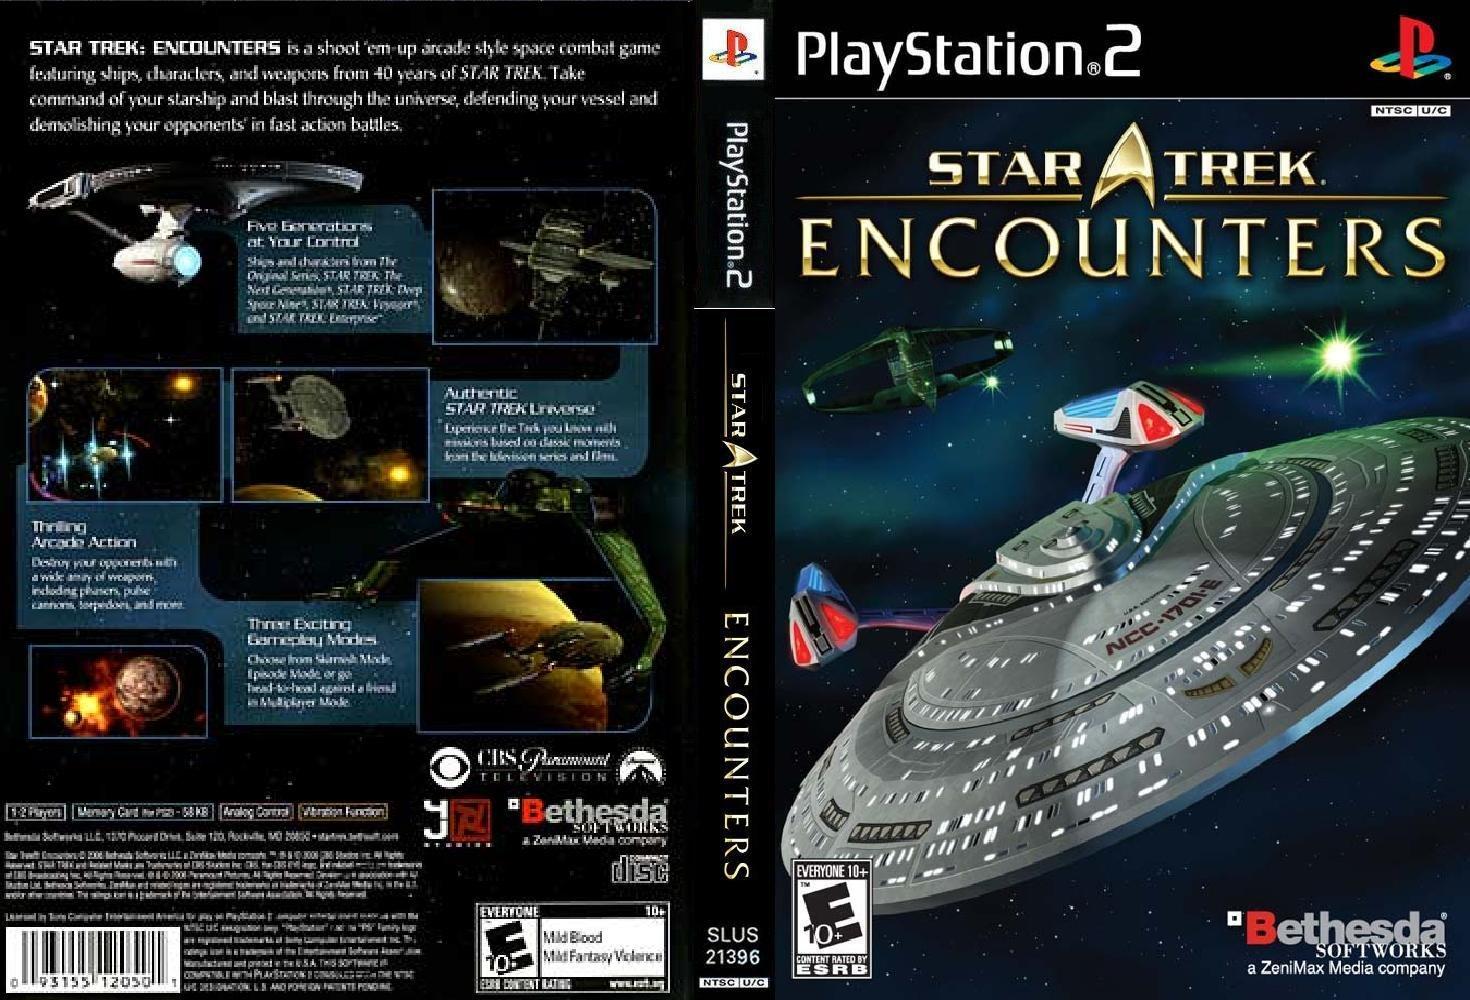 Star Trek - Encounters